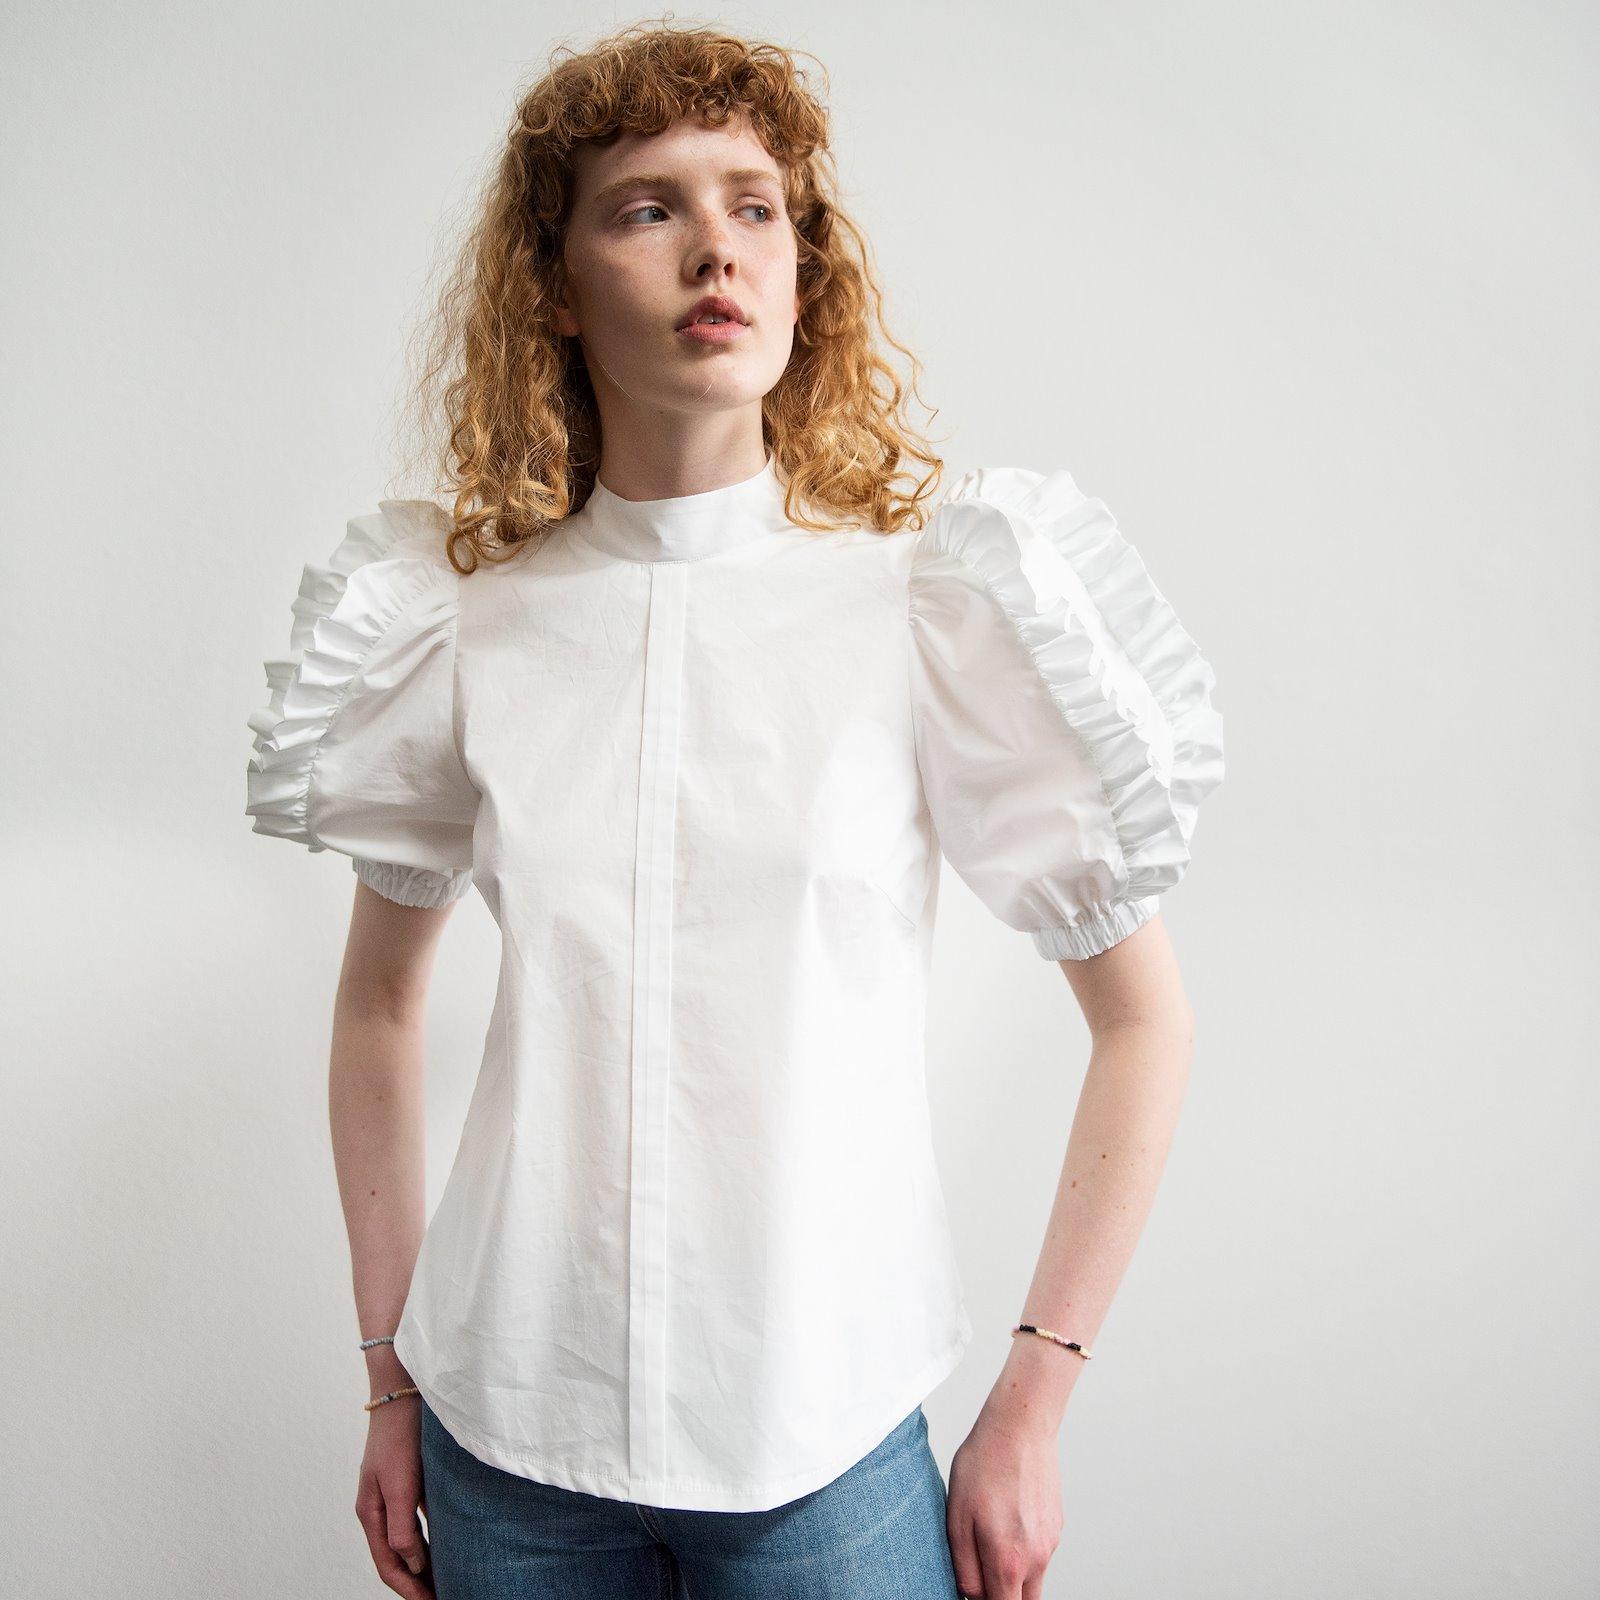 Design your own blouse, 44/16 p22075_33023_540111_DIY8020_sskit